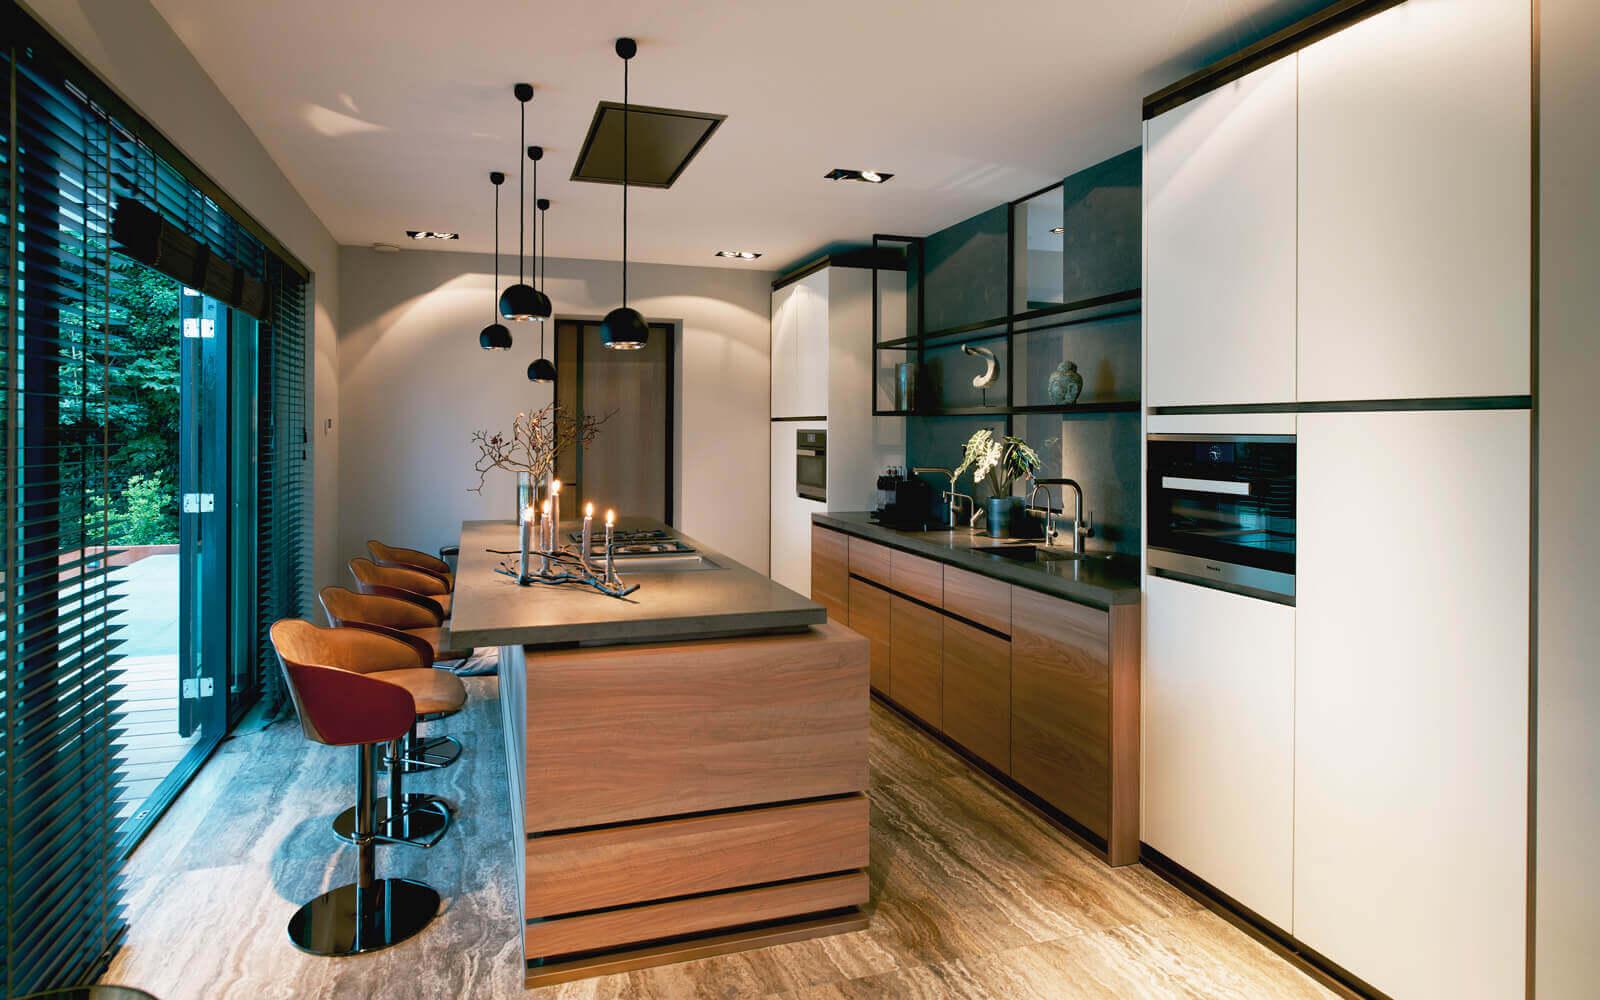 Stijlvolle keukens van Tieleman Keukens